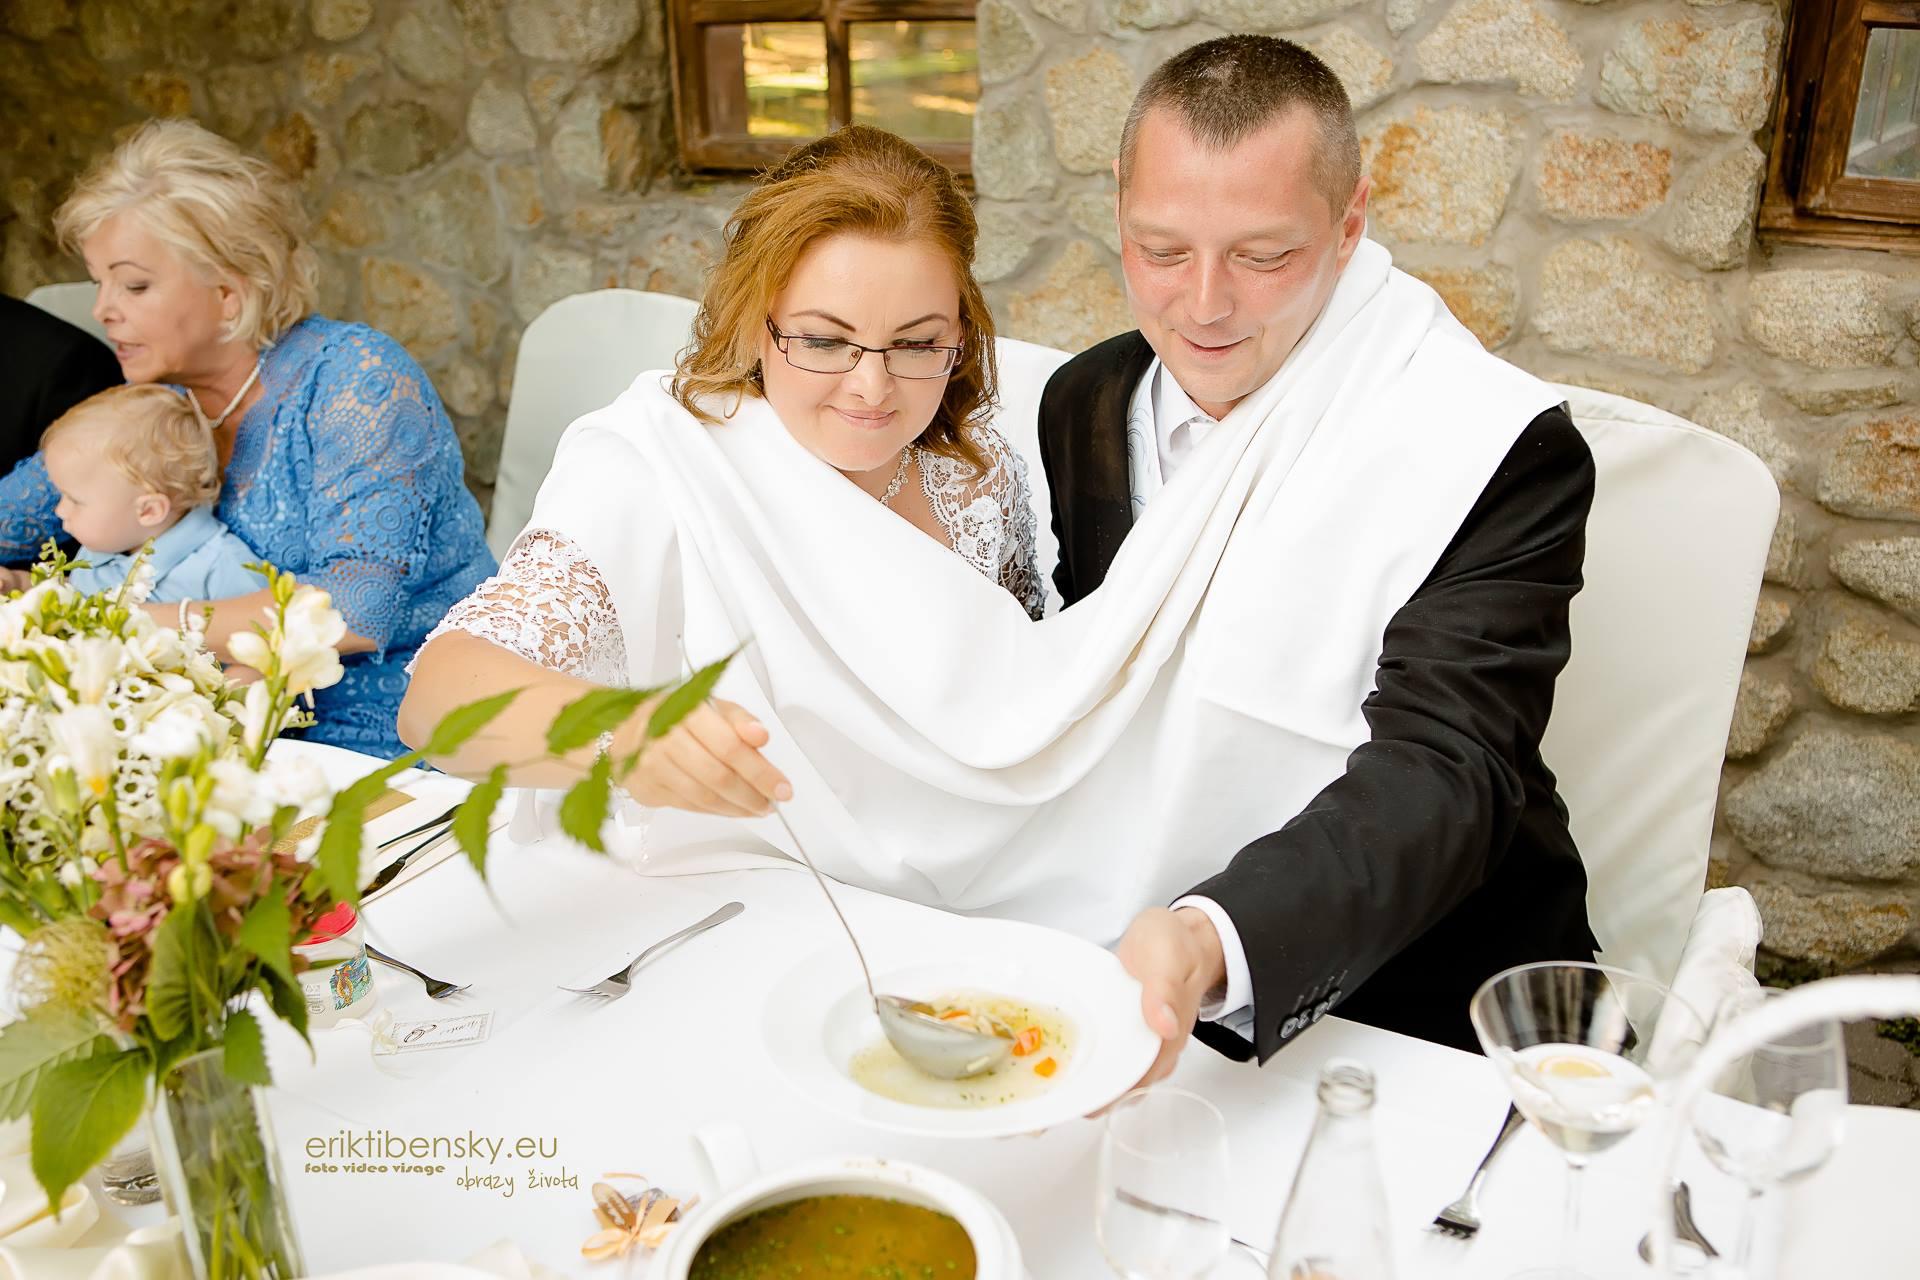 eriktibensky-eu-svadobny-fotograf-wedding-photographer-3038